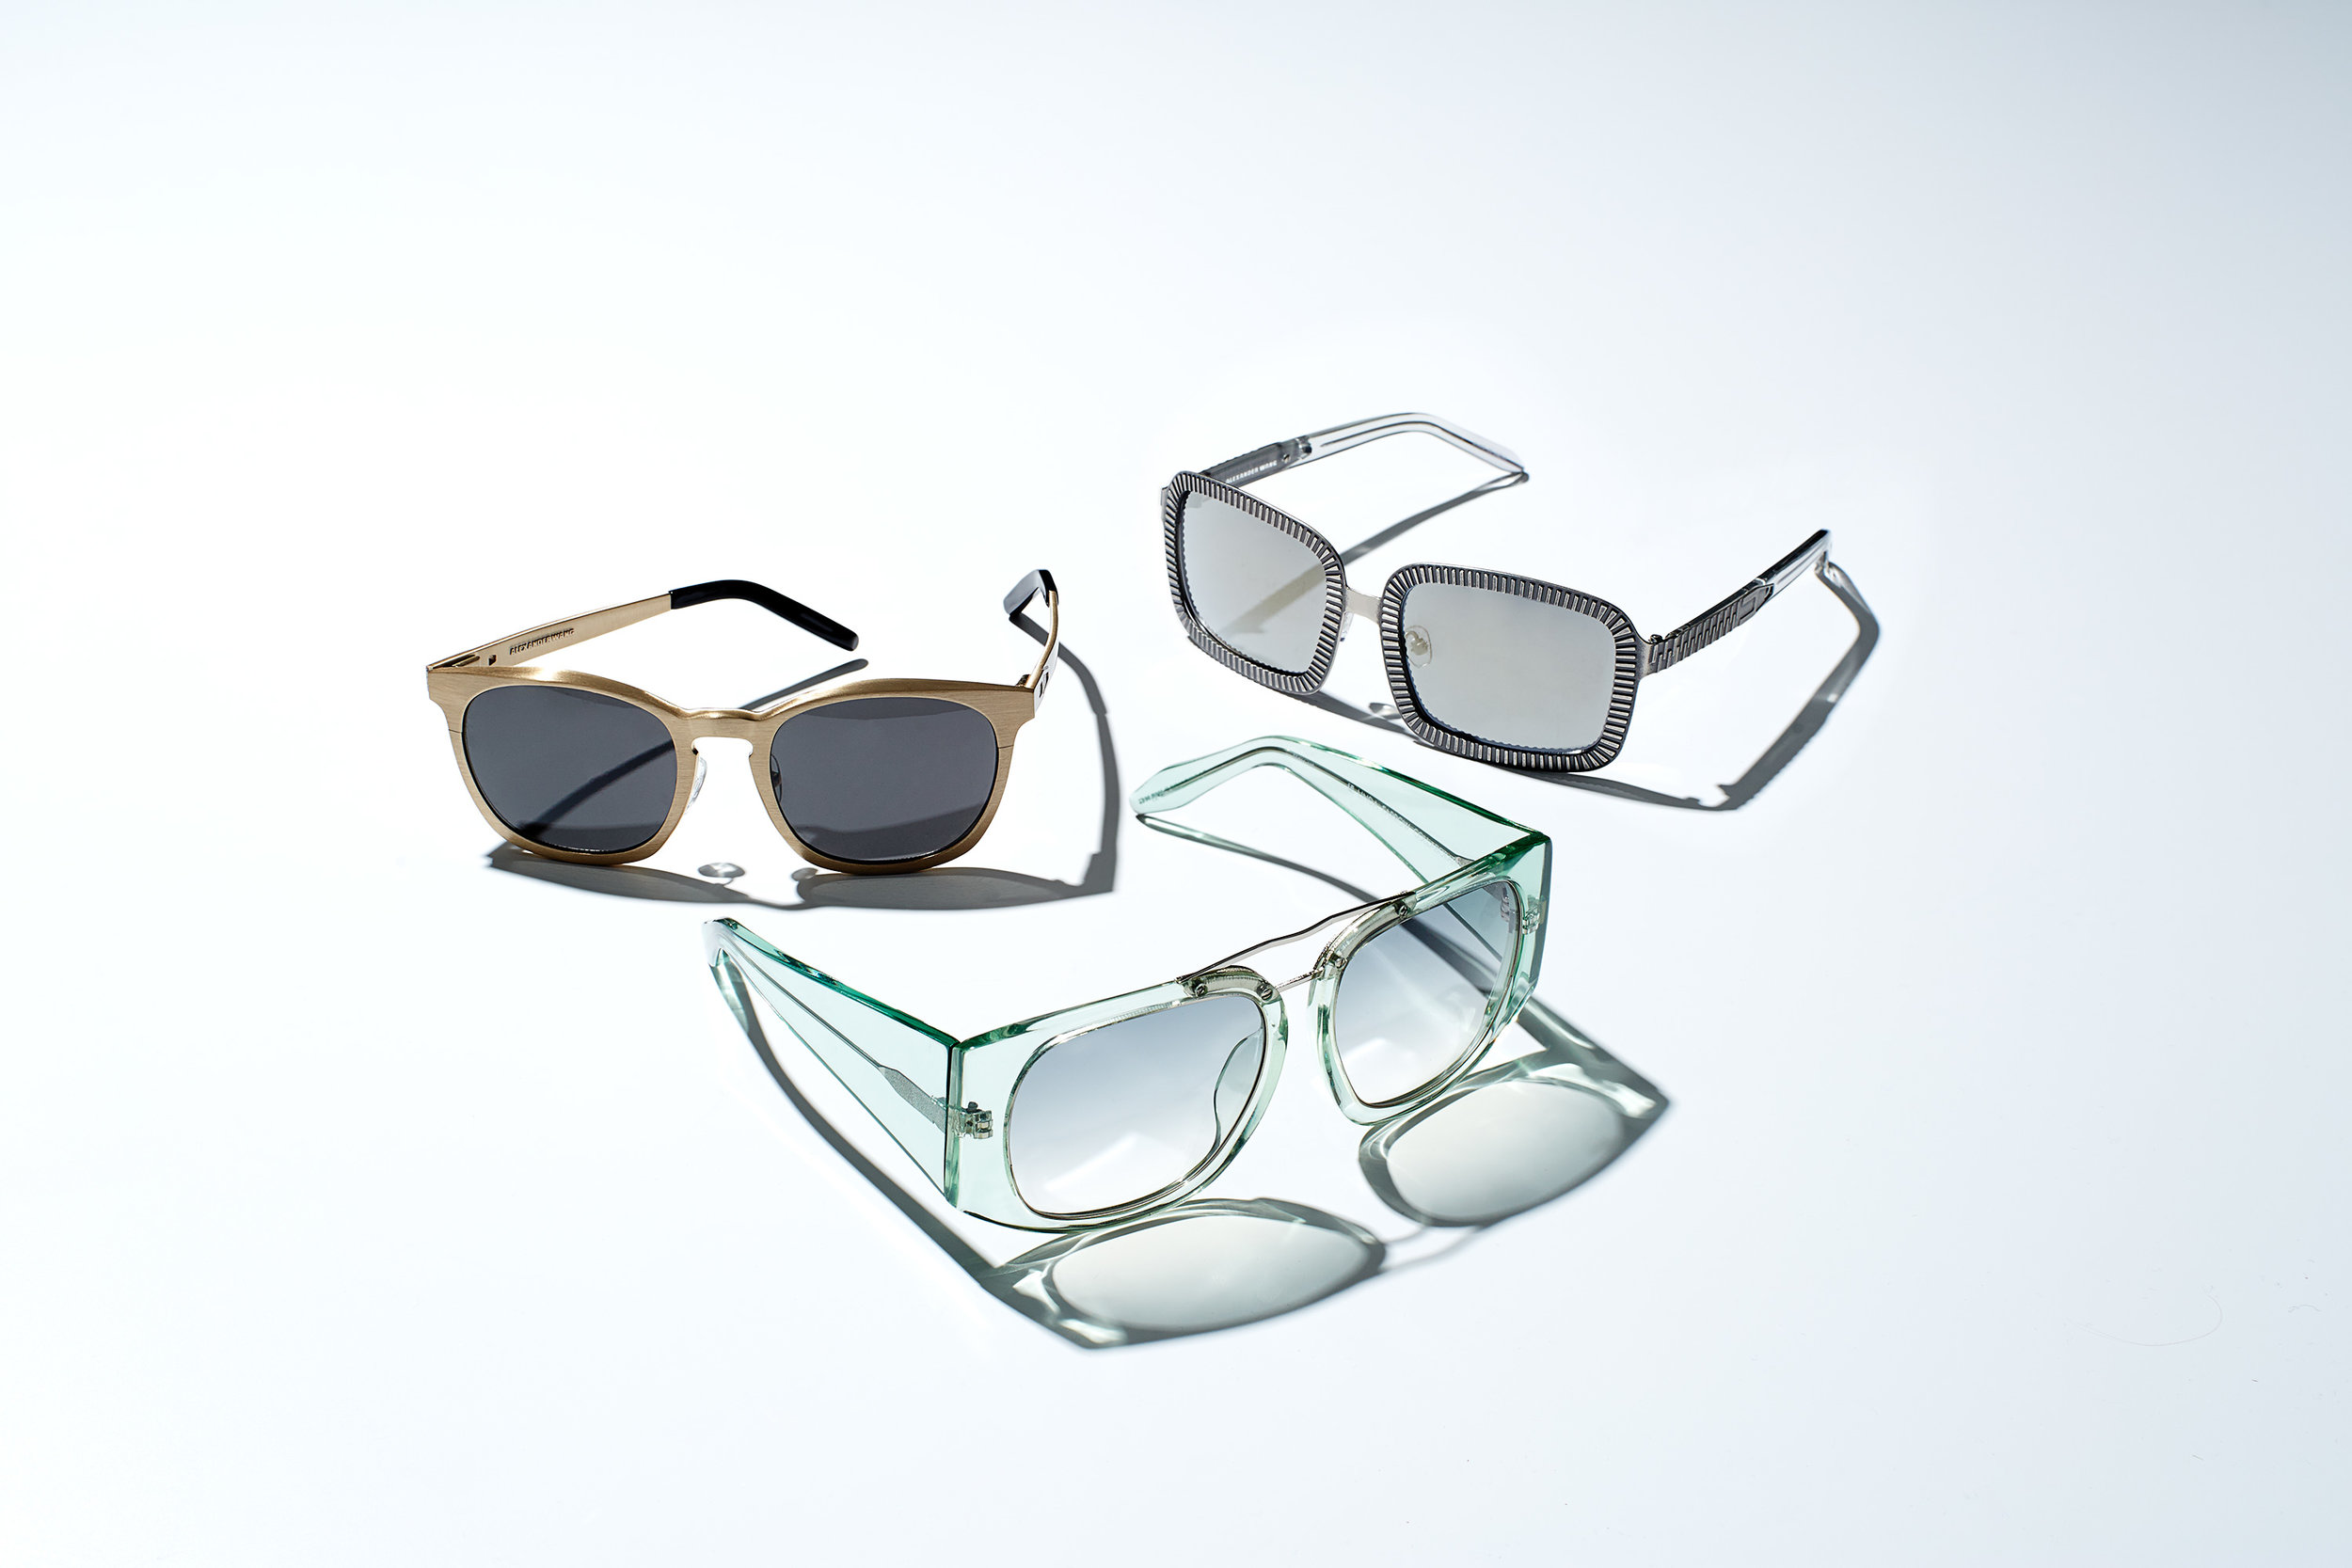 sunglasses_clean.jpg